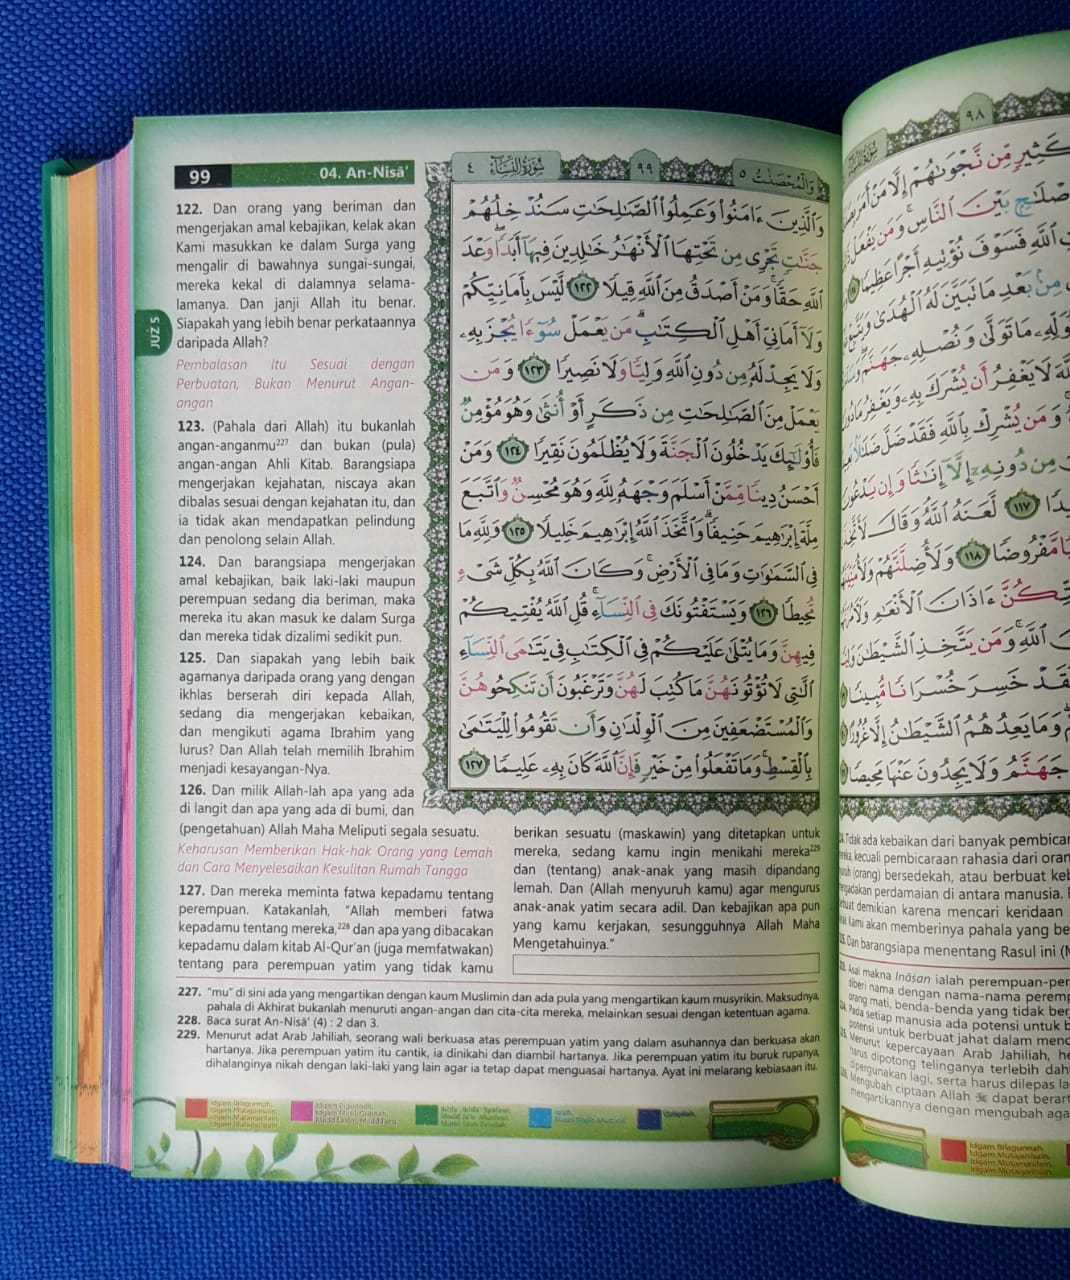 Al-Qur'an-Tajwid-Berwarna-Dan-Terjemah-Ibrahim Ukuran-A5-isi